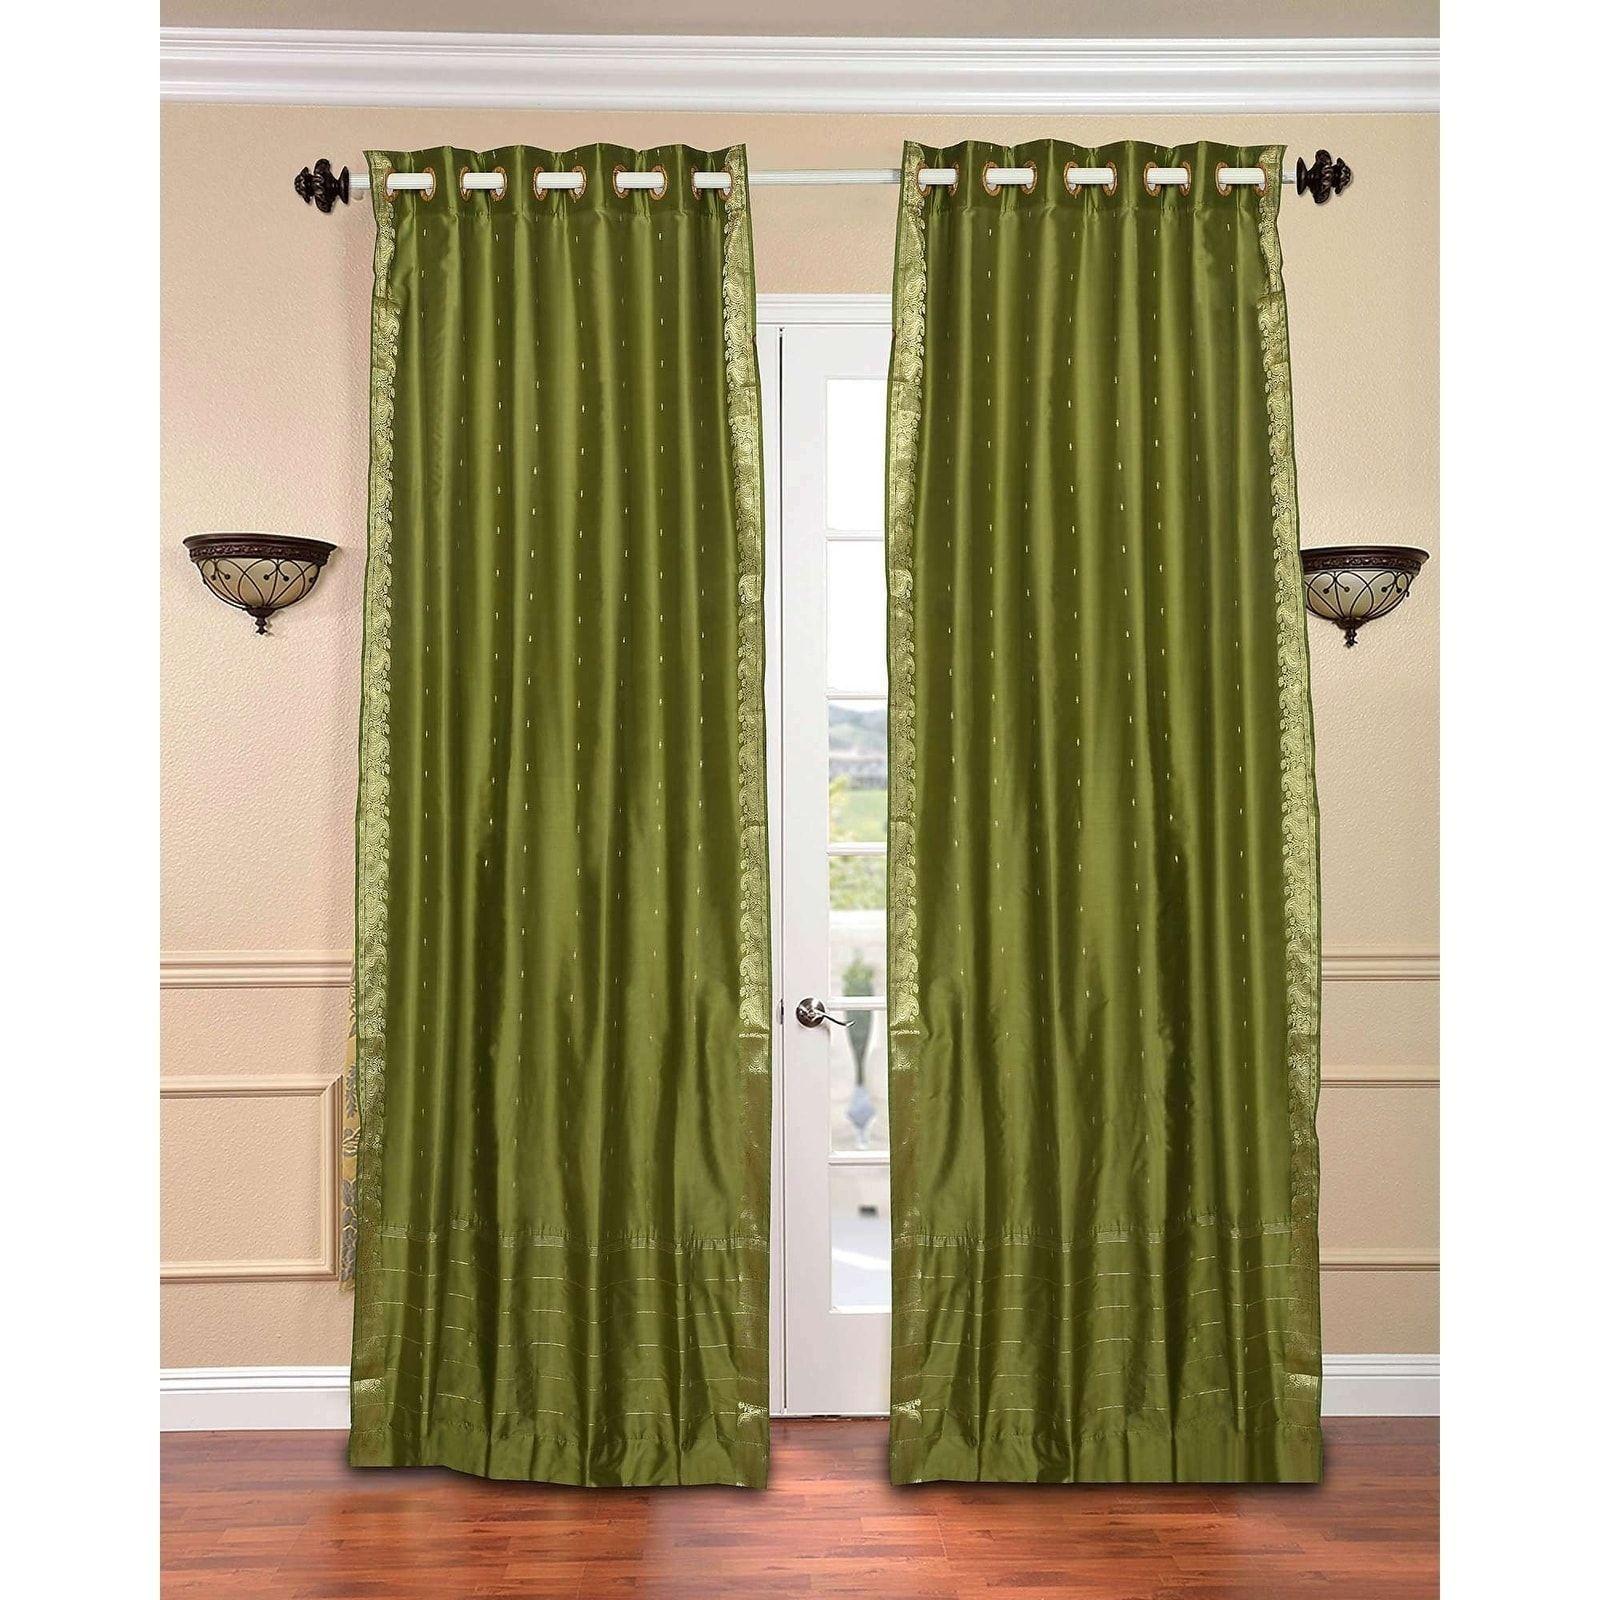 Indian Selections Olive Green Ring Top Sheer Sari Curtain / Drape ...